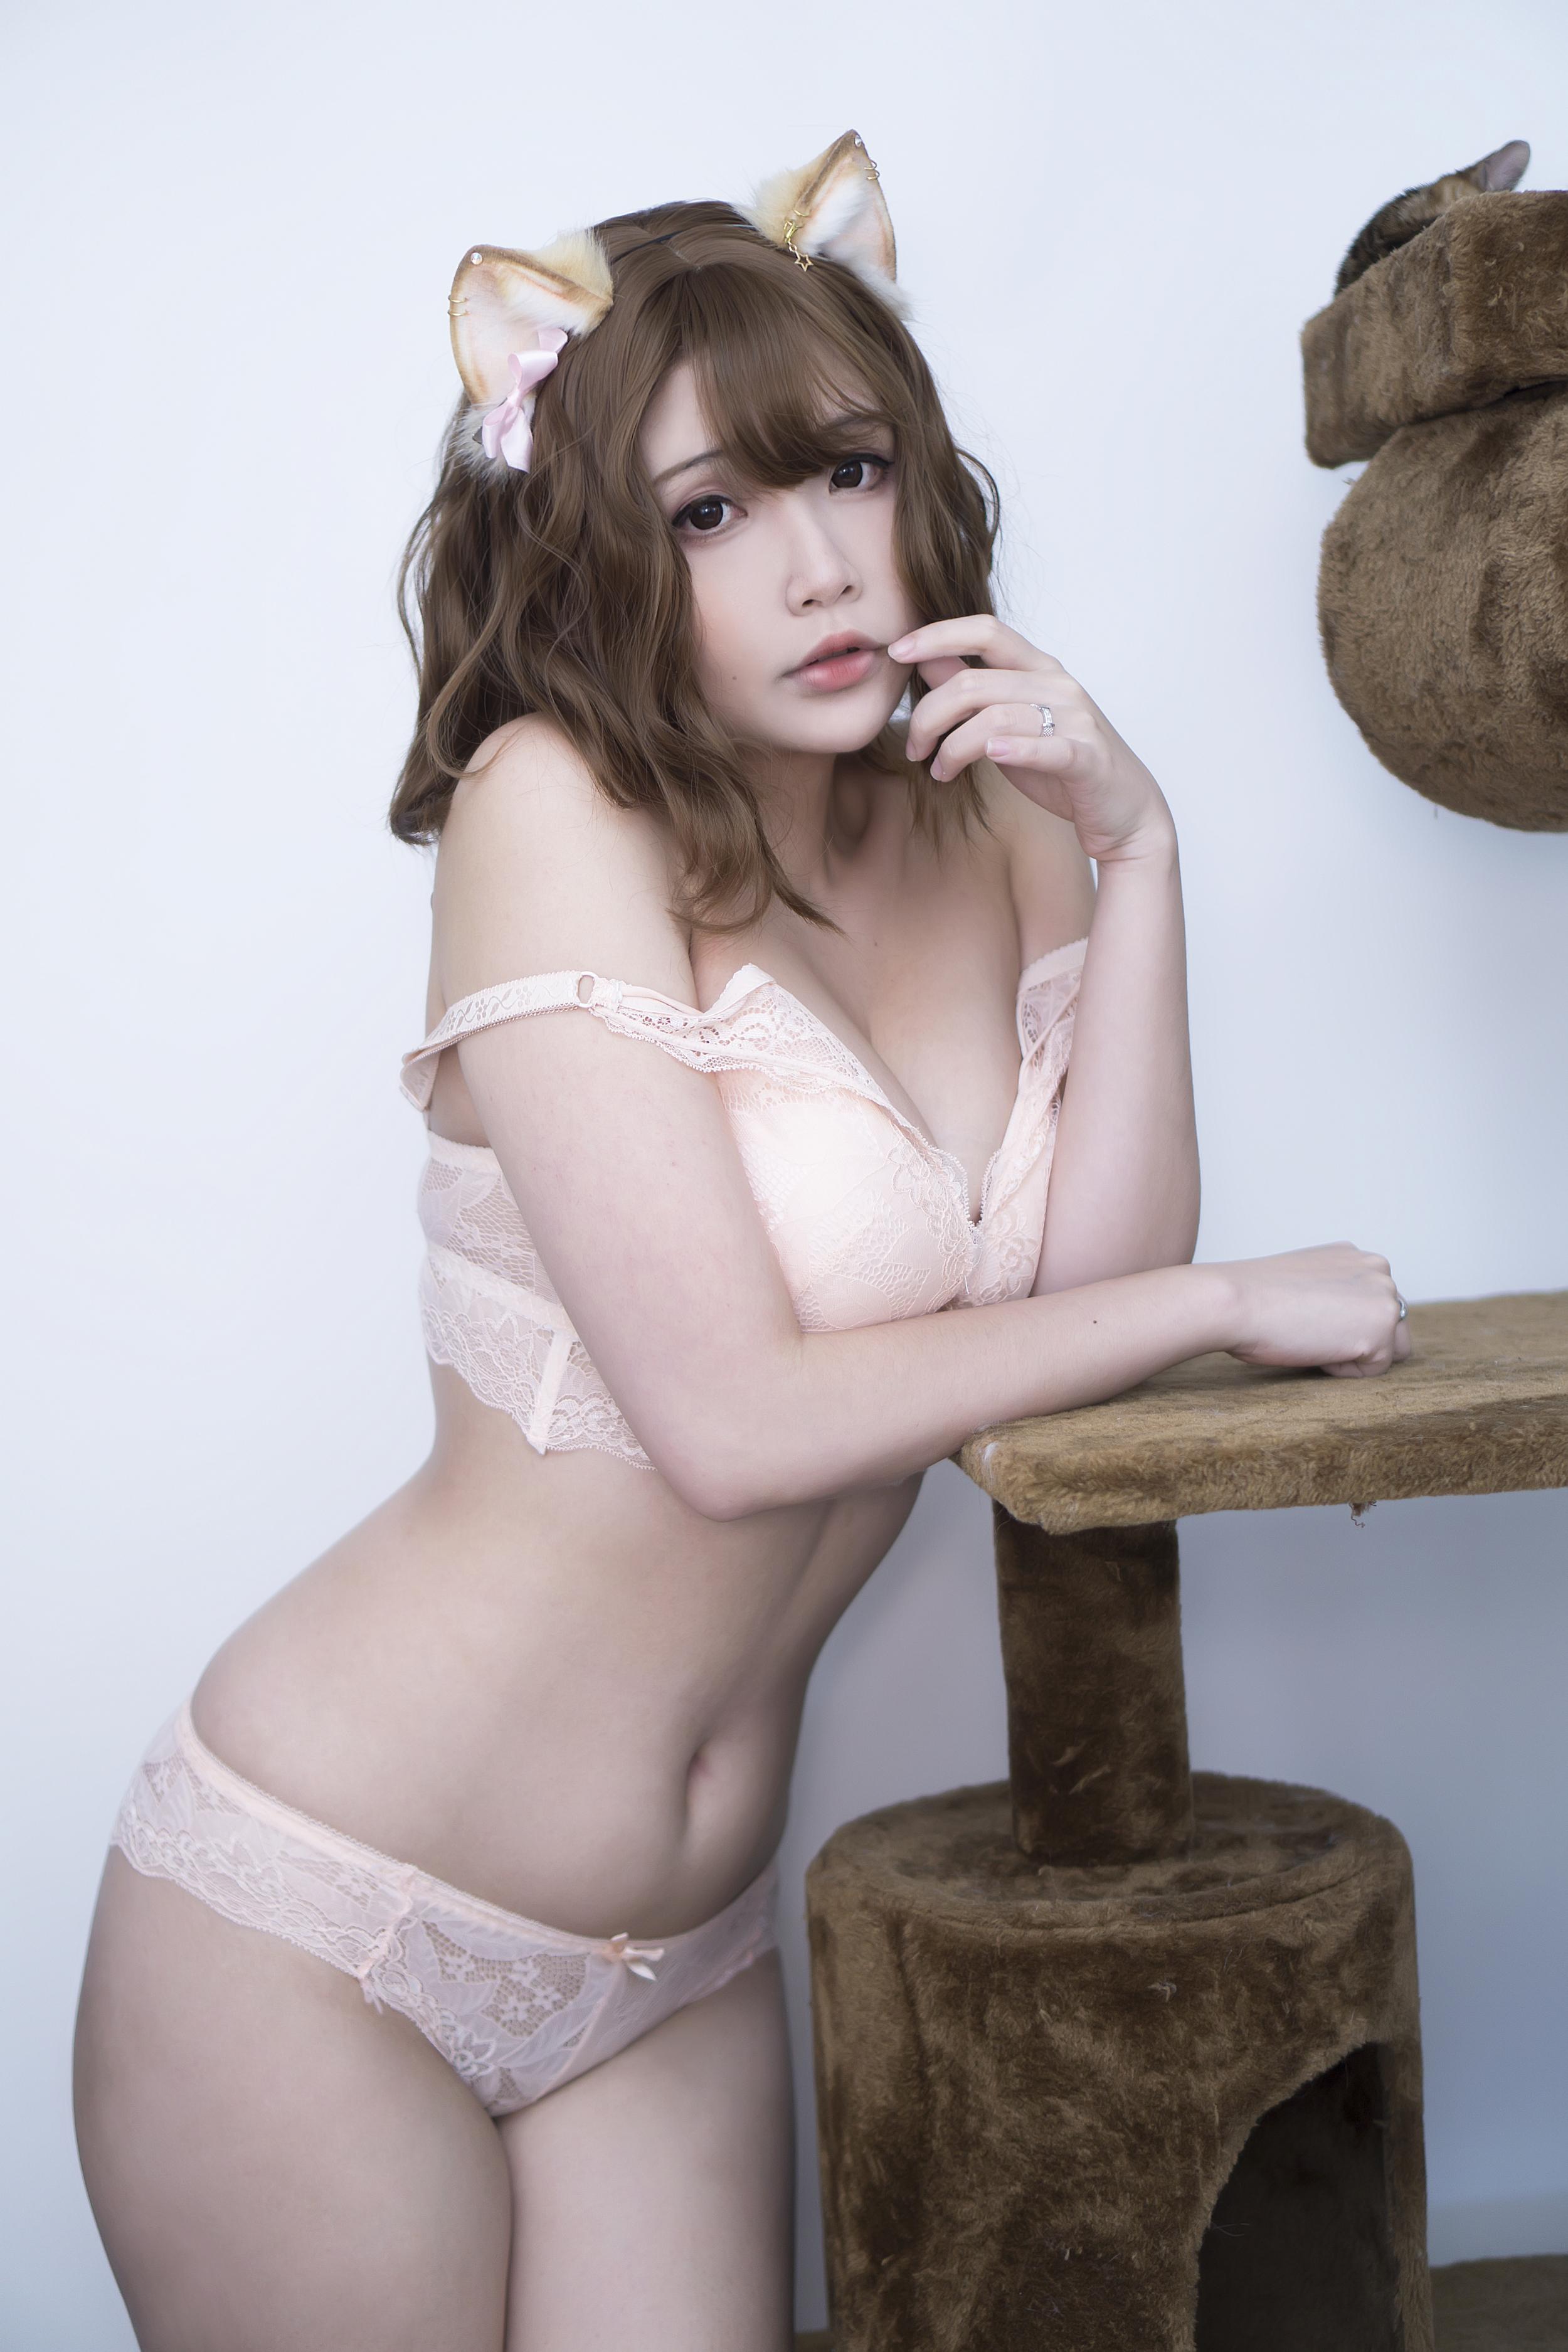 People 2500x3750 Hana Bunny women model Asian cosplay cat girl nekomimi cat ears underwear lingerie bra panties indoors women indoors bare shoulders sensual gaze bangs looking at viewer parted lips